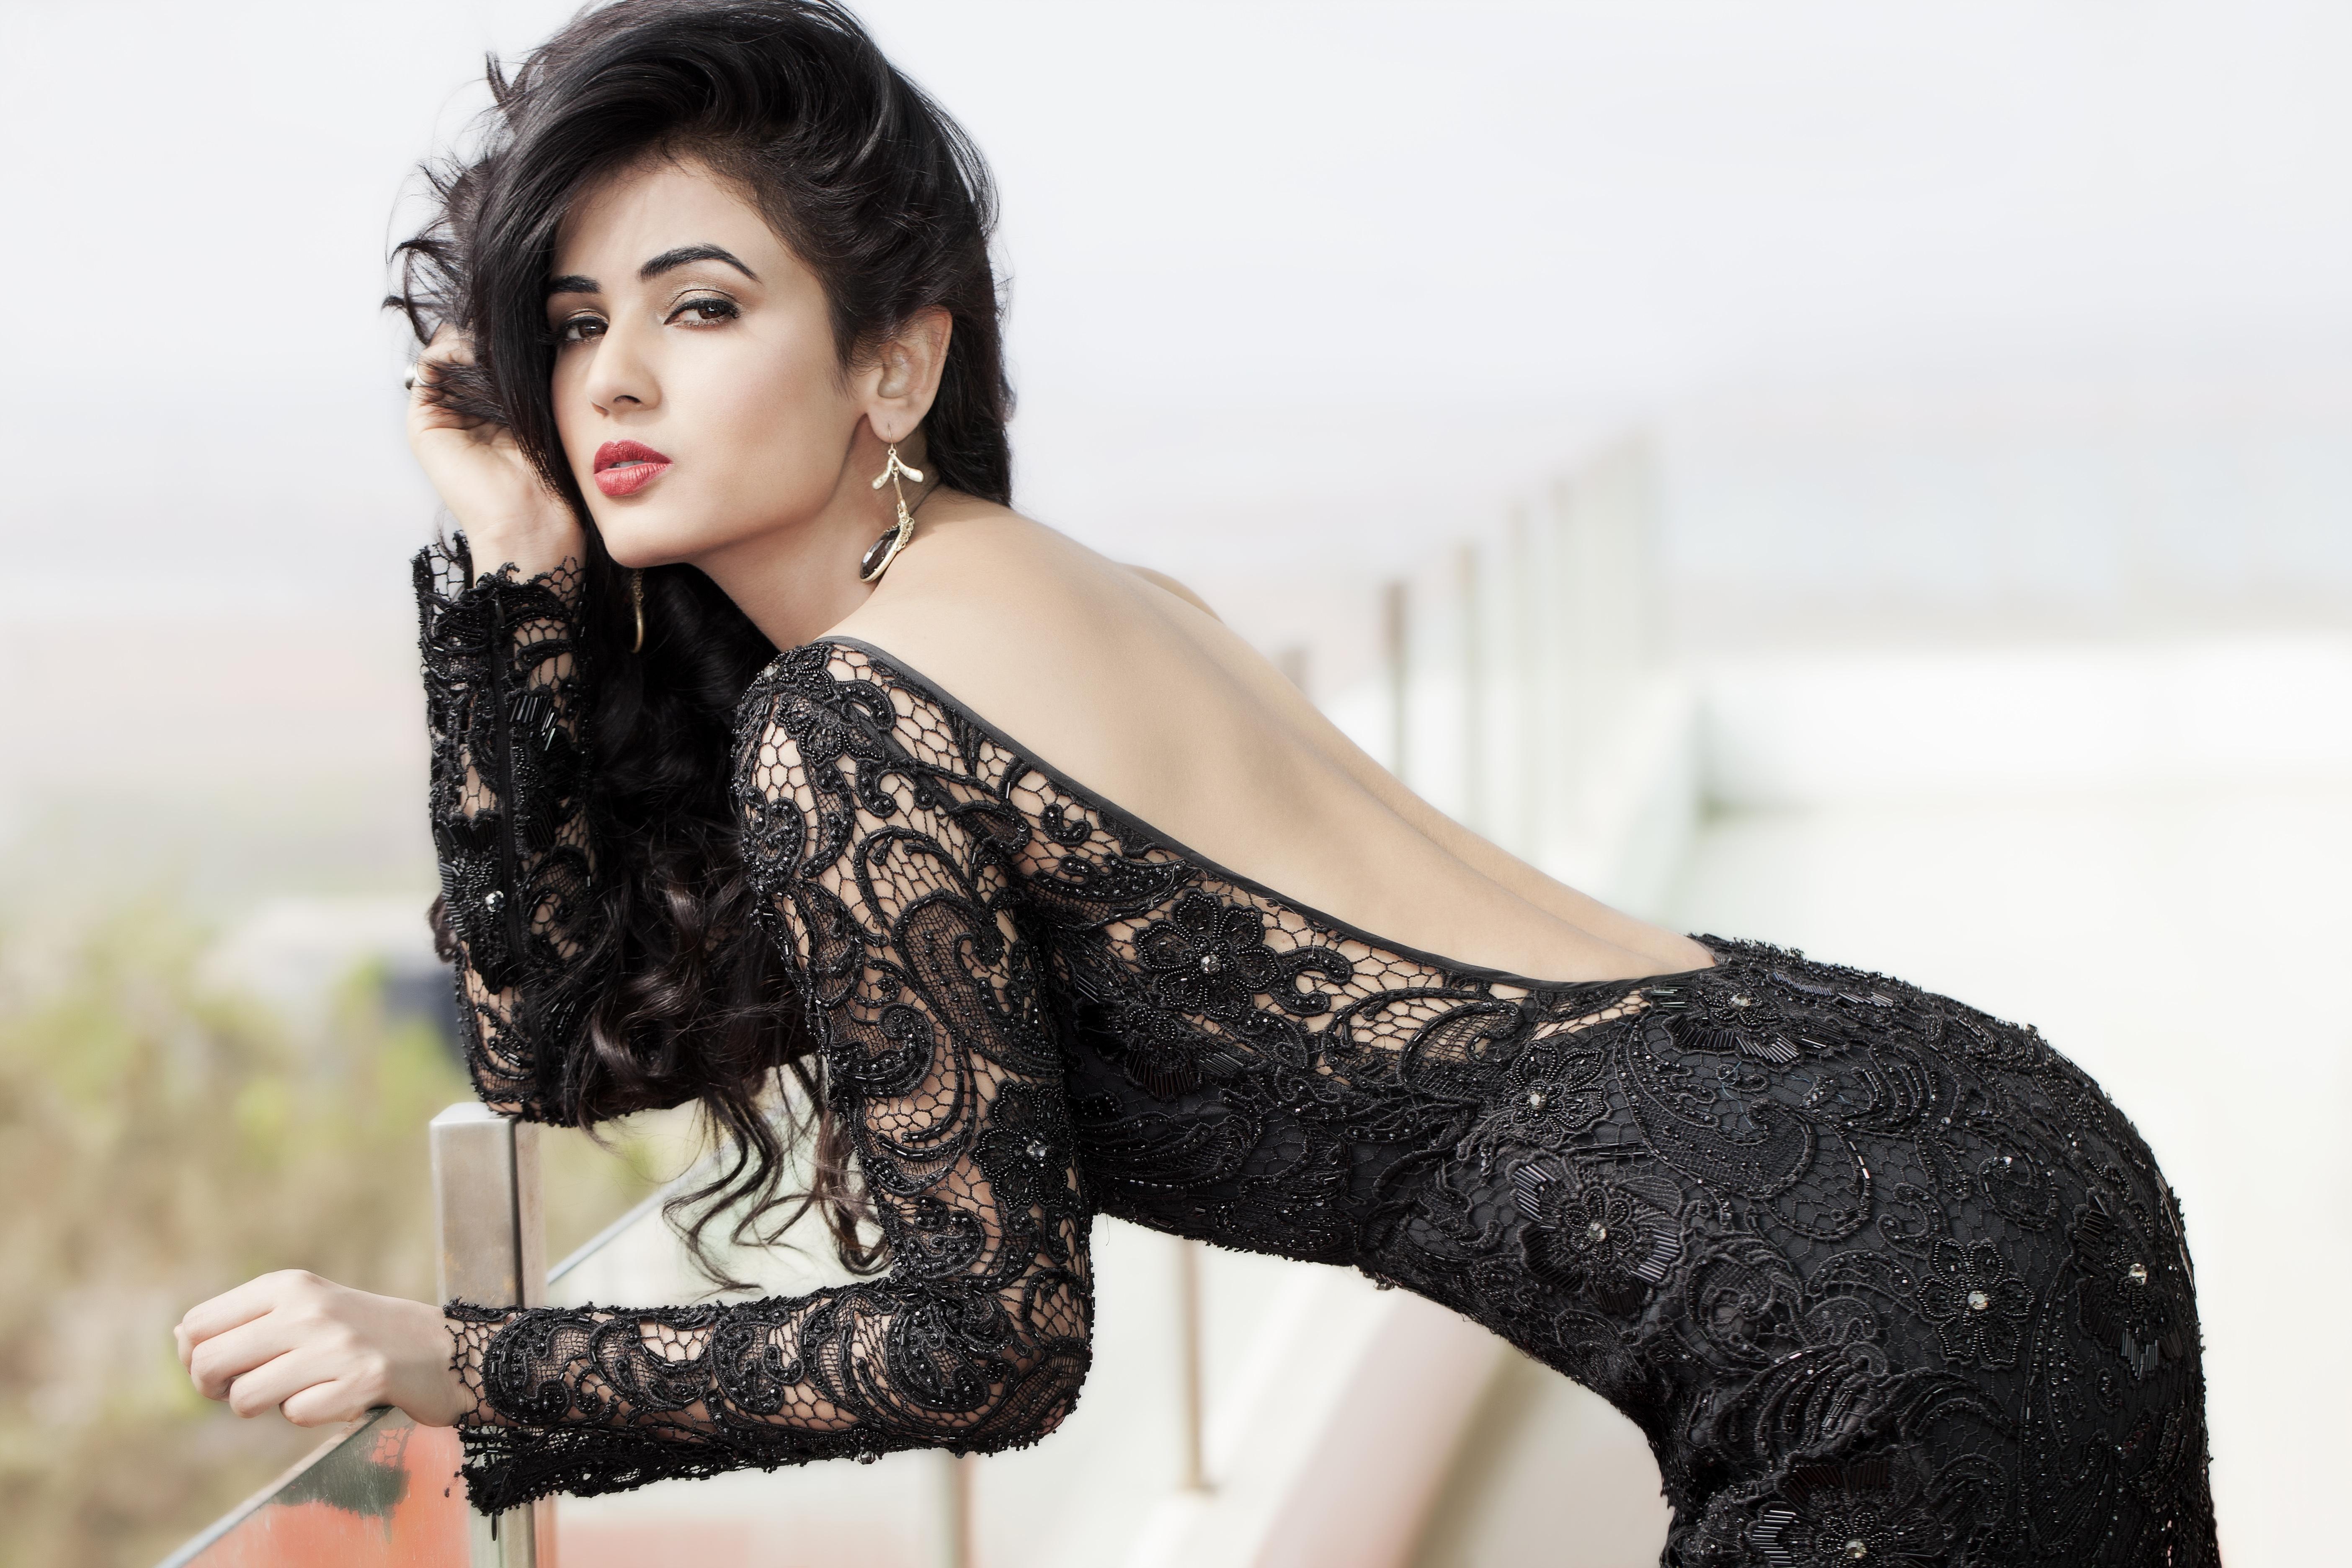 Download Wallpaper Girl Actress Beauty Girl Sexy Beautiful